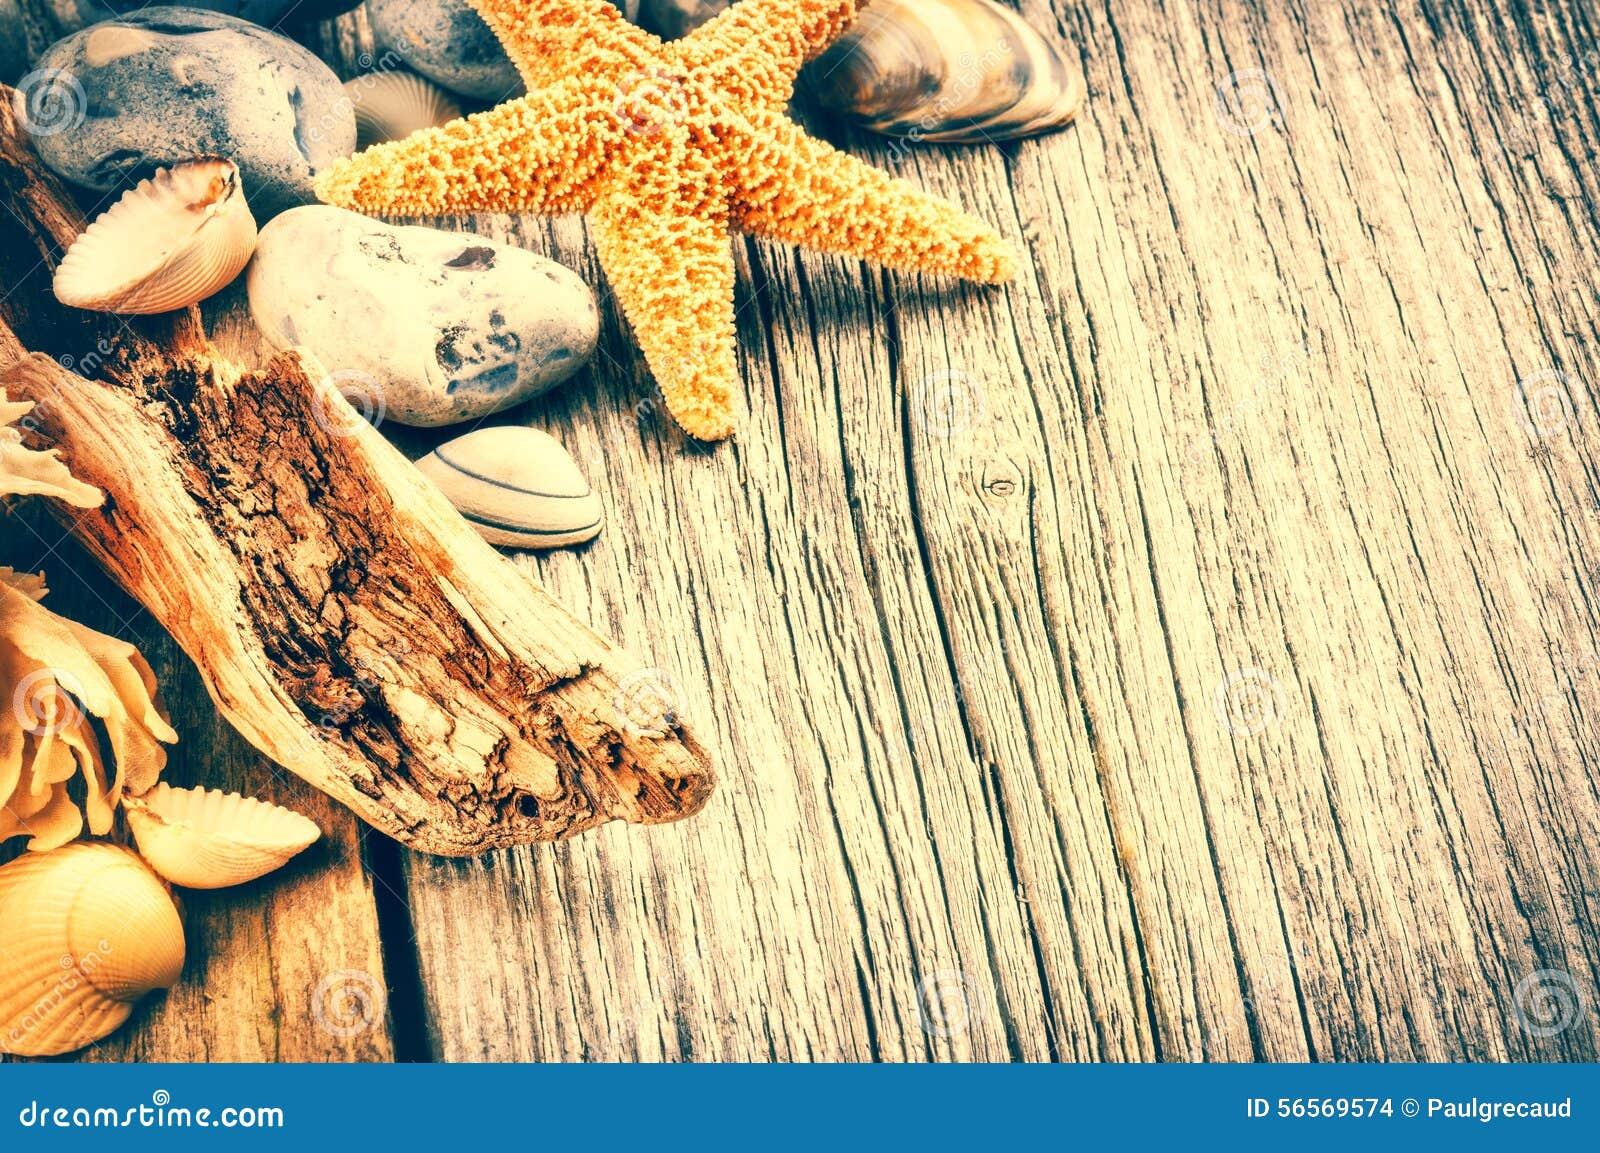 Download Θερινό υπόβαθρο με τα χαλίκια και τον αστερία Στοκ Εικόνες - εικόνα από διάστημα, διακόσμηση: 56569574